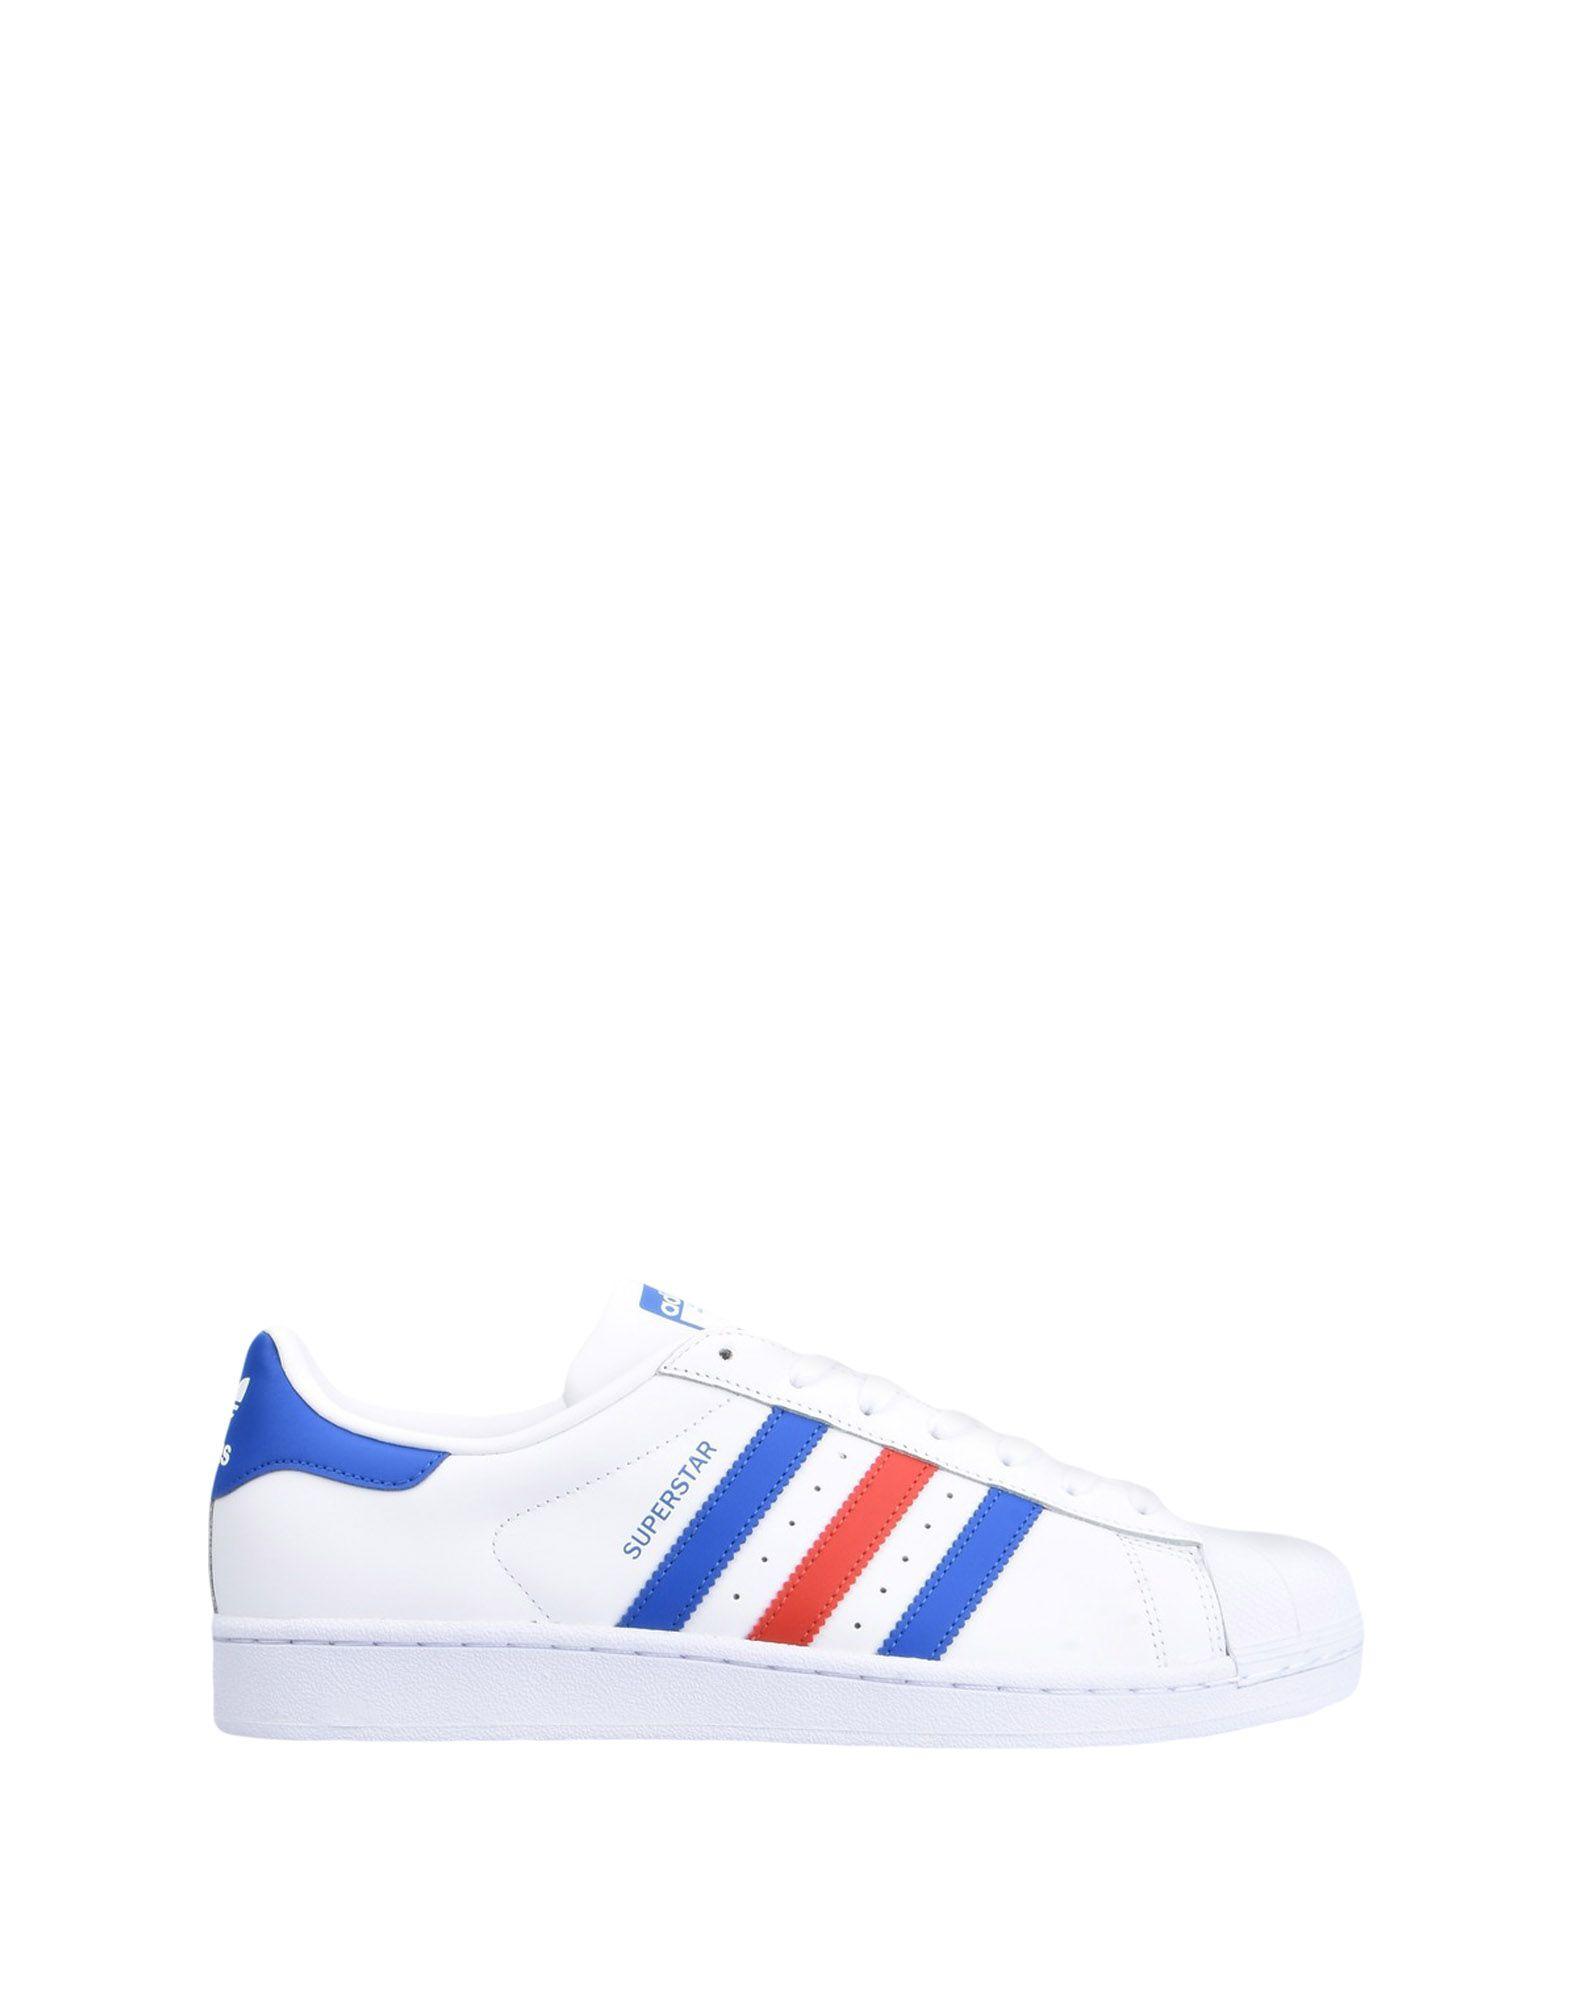 Adidas  Originals Superstar  Adidas 11248456XM Heiße Schuhe 8d173c